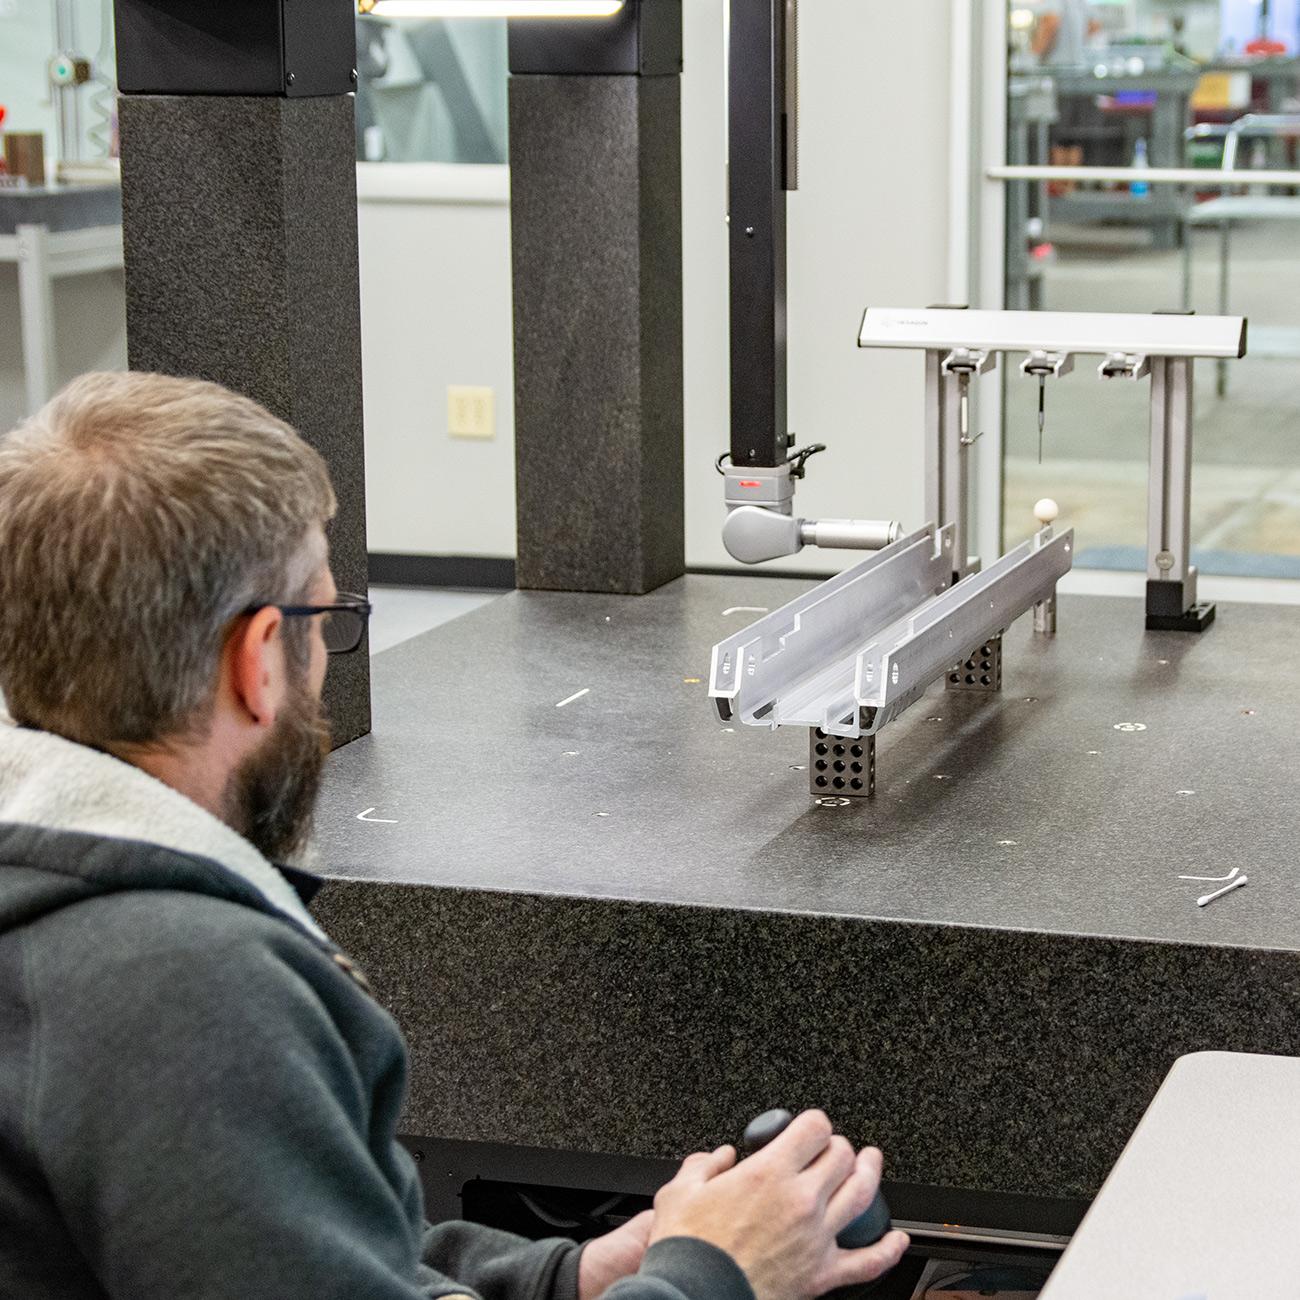 MST-Shop-Floor-2019-Inset-Inspection-3